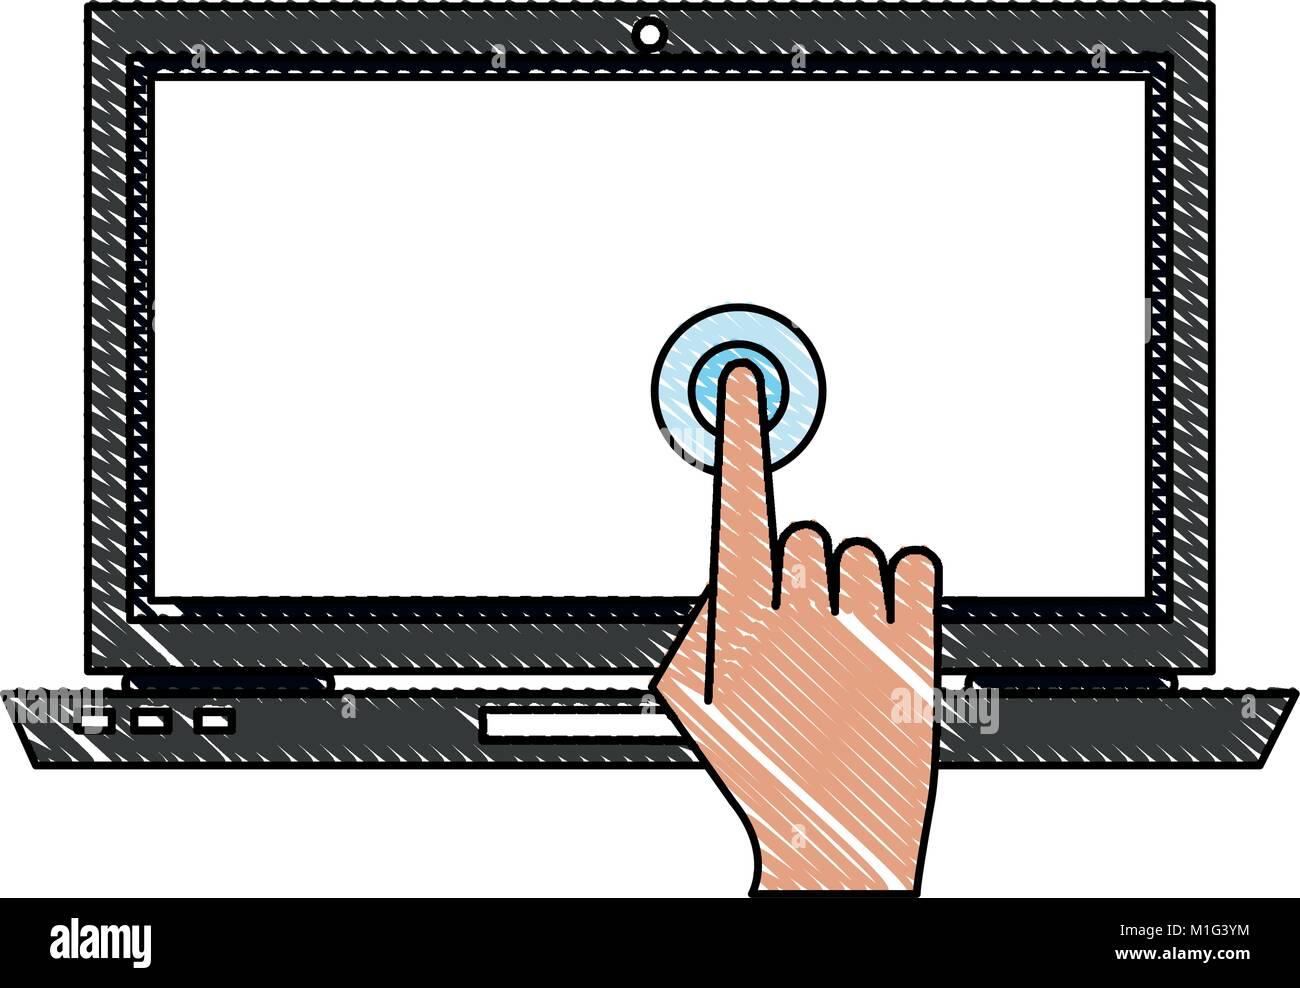 Laptop touchscreen technology - Stock Image